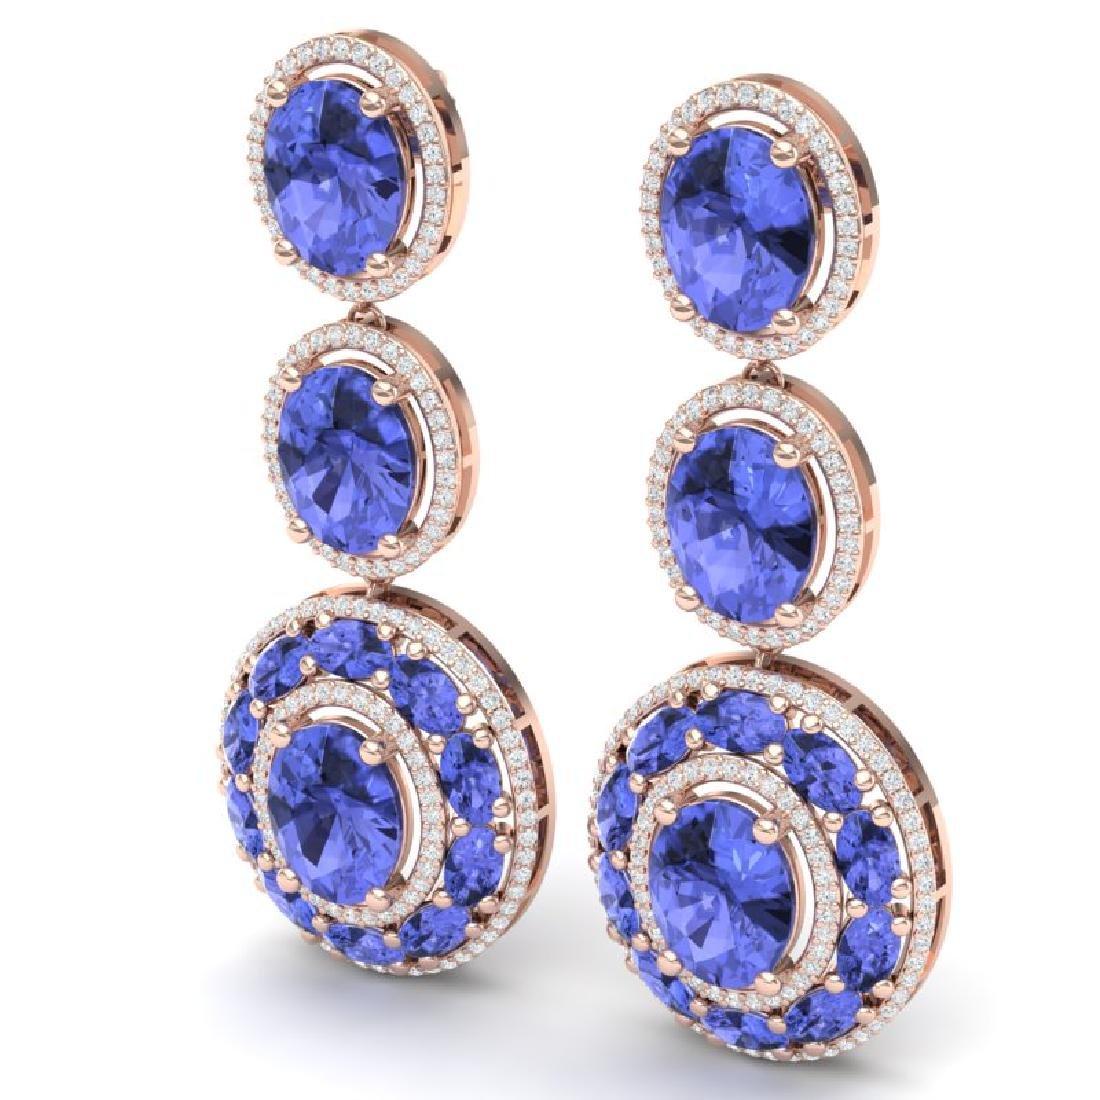 33.72 CTW Royalty Tanzanite & VS Diamond Earrings 18K - 2